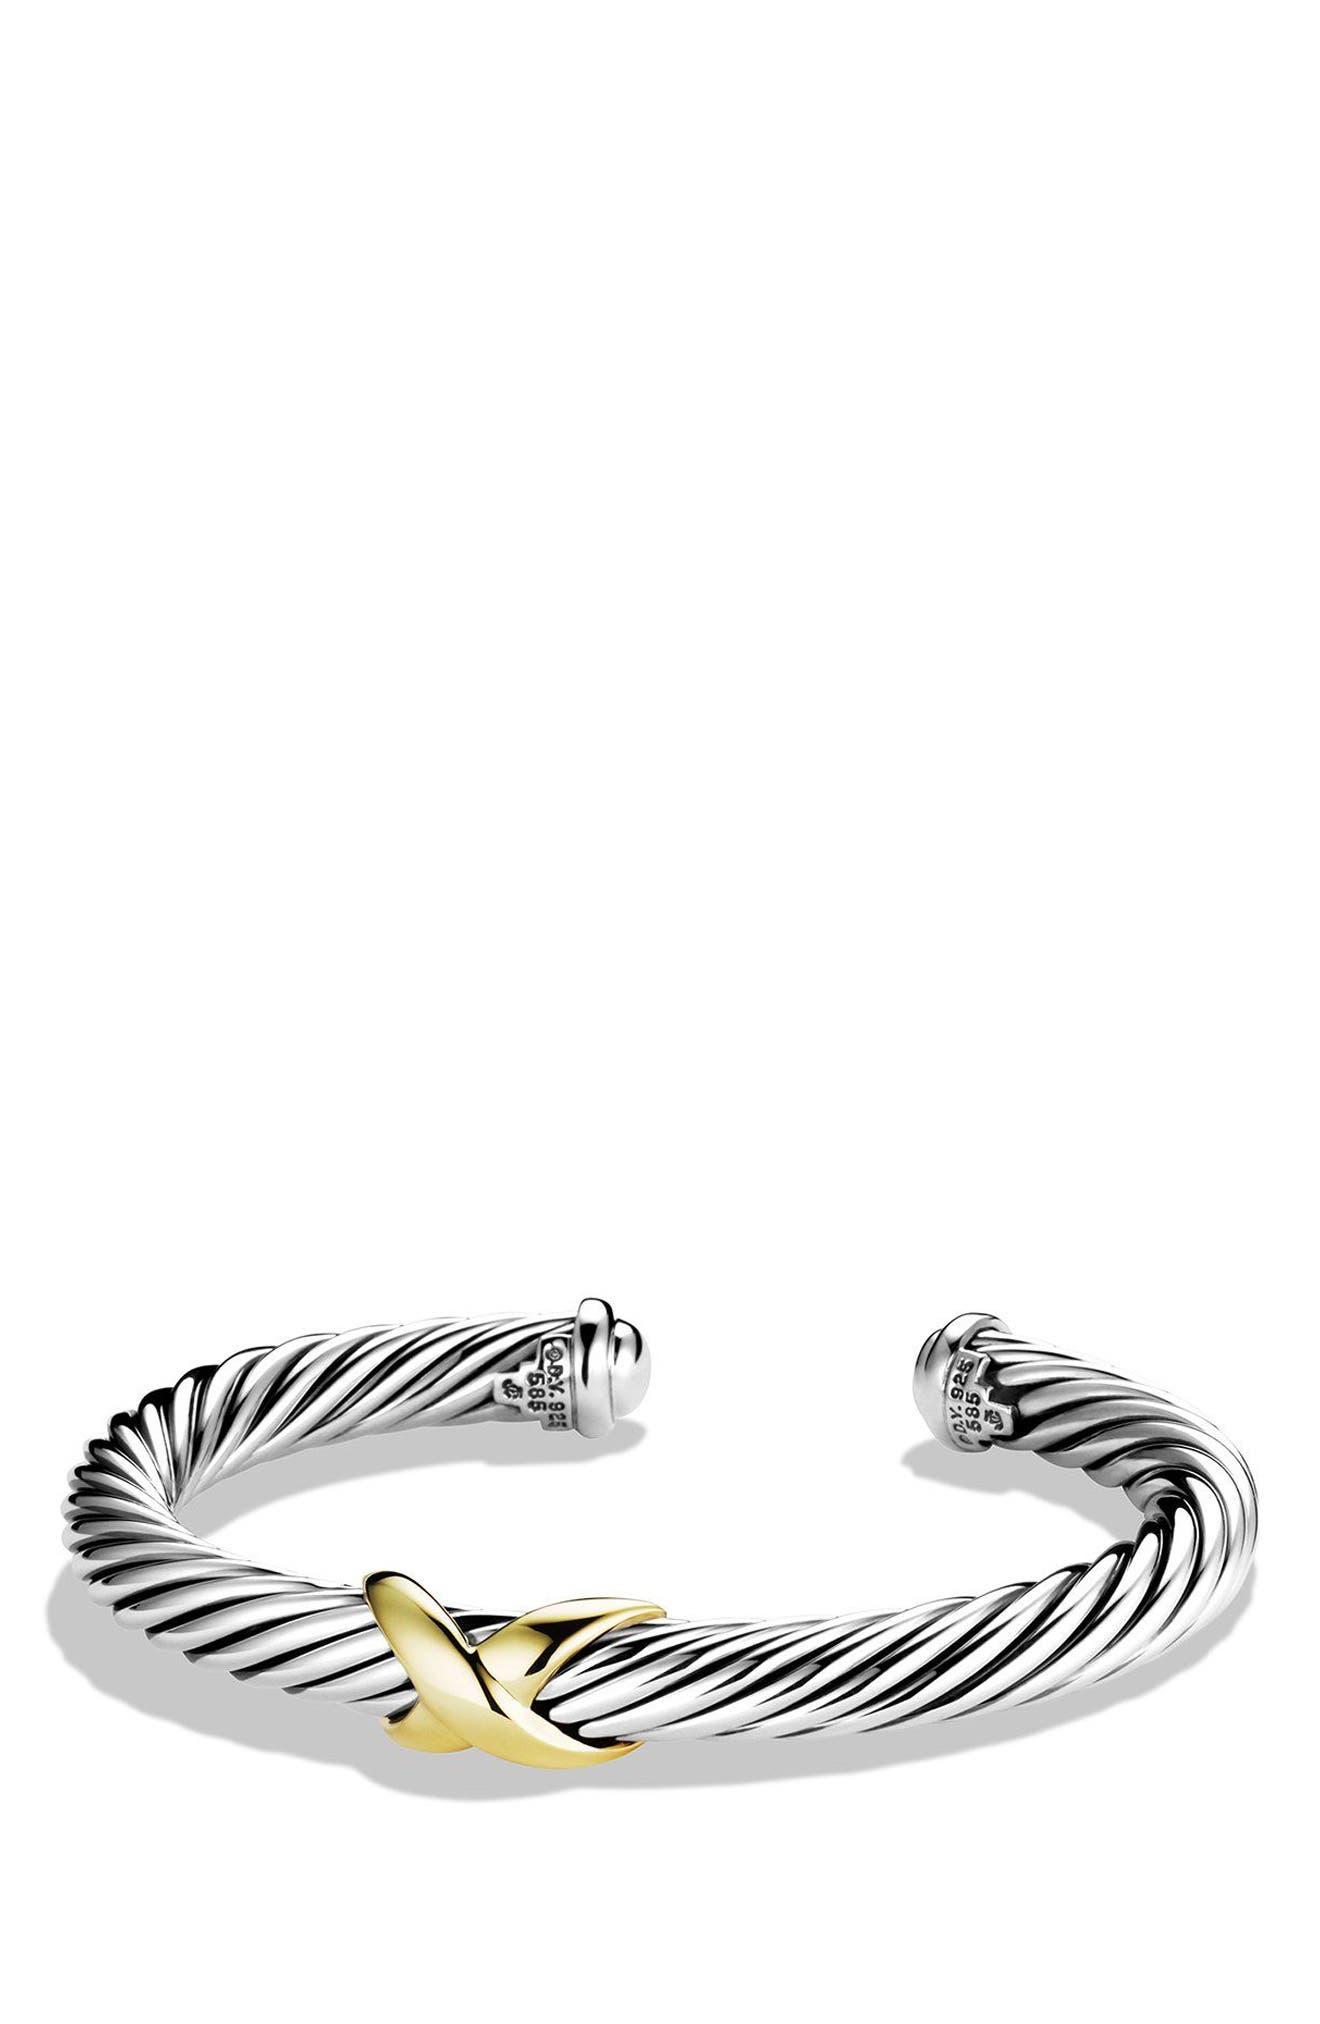 X Bracelet with 14K Gold,                         Main,                         color, SILVER/ 14K GOLD